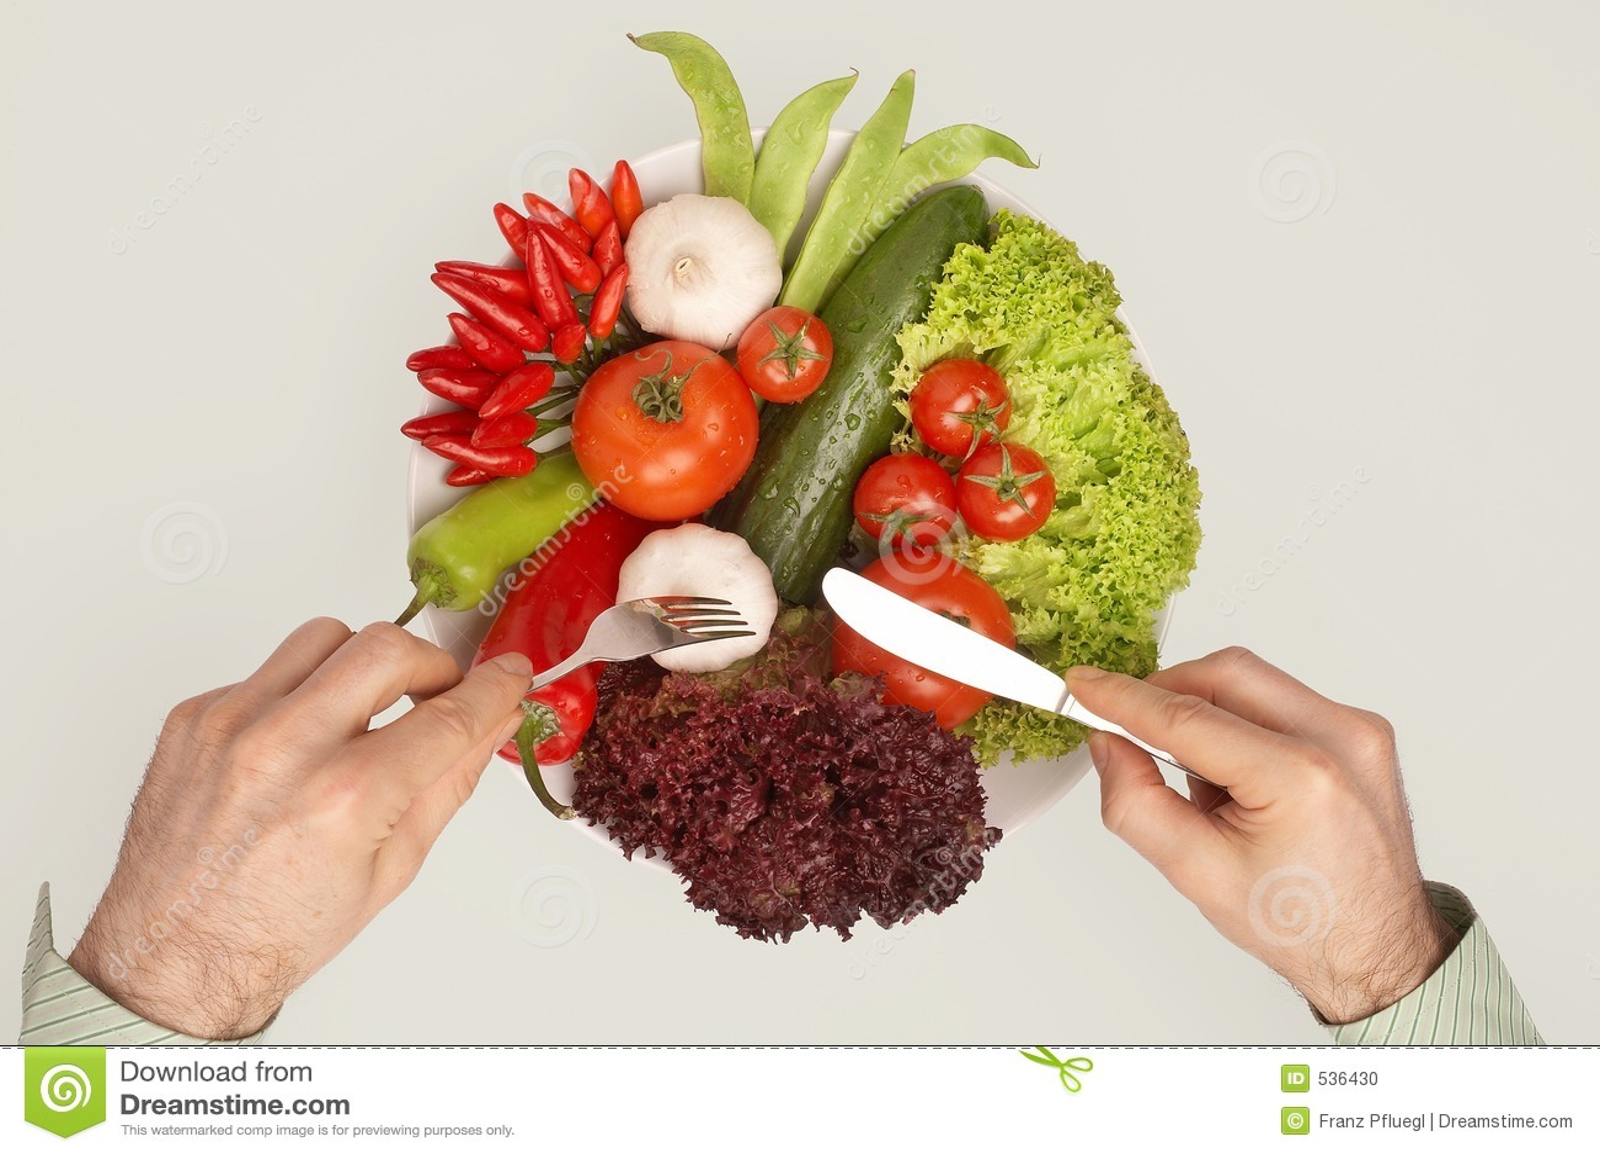 Download 截去的健康mahlzeit膳食路径 库存照片. 图片 包括有 工厂, 日期, 辣椒粉, 适应, 出纳员, 手指 - 536430